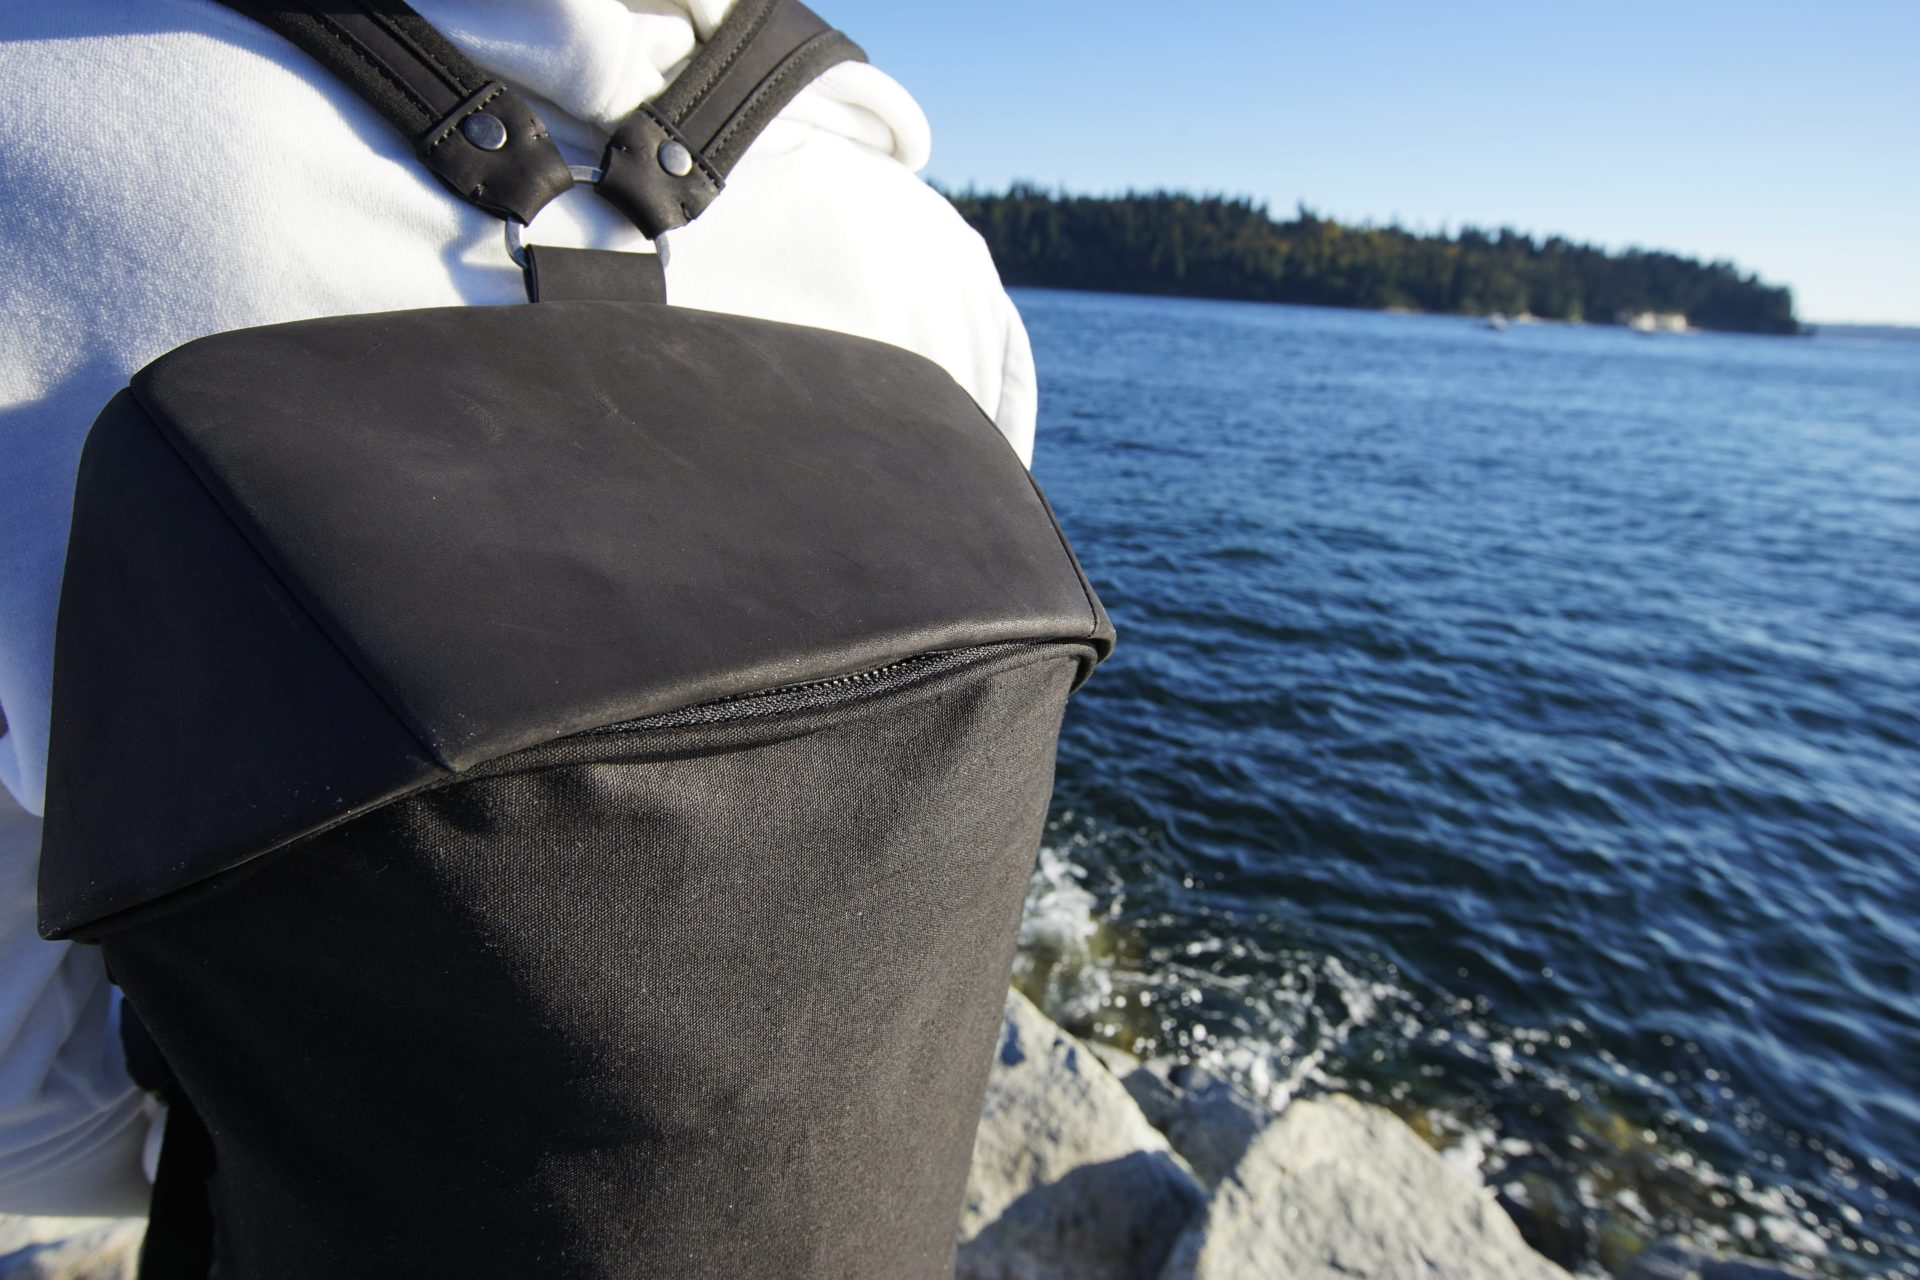 Little Black Bag by the ocean